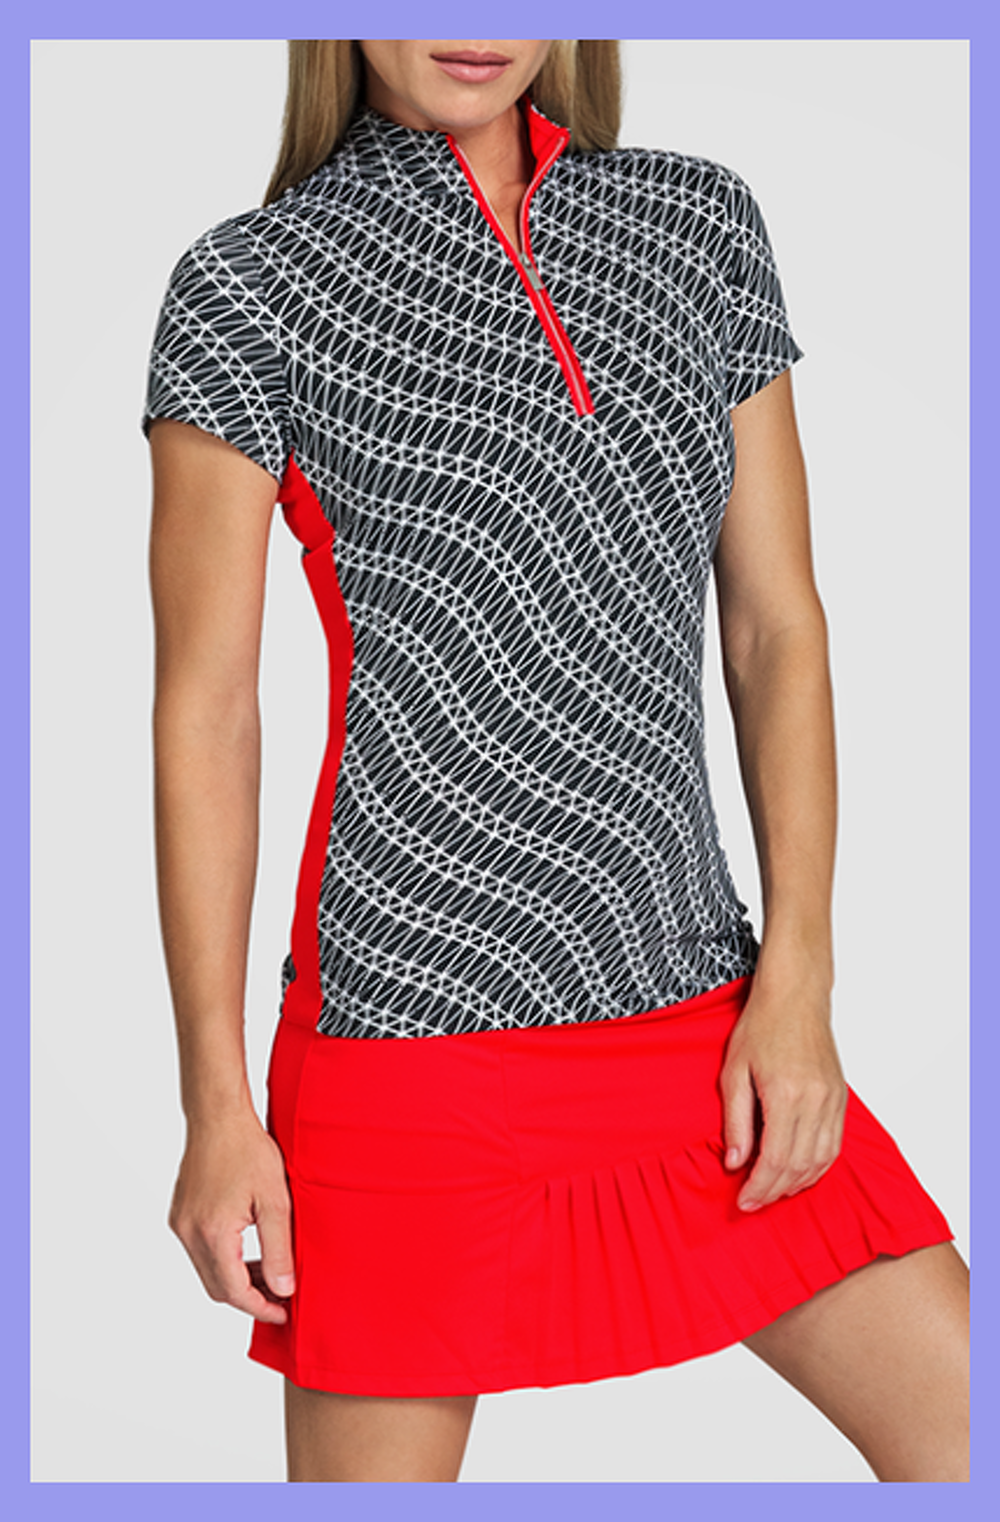 Ggblue Defined Fae Sleeveless Polo Golf Attire Women Golf Outfits Women Golf Outfit